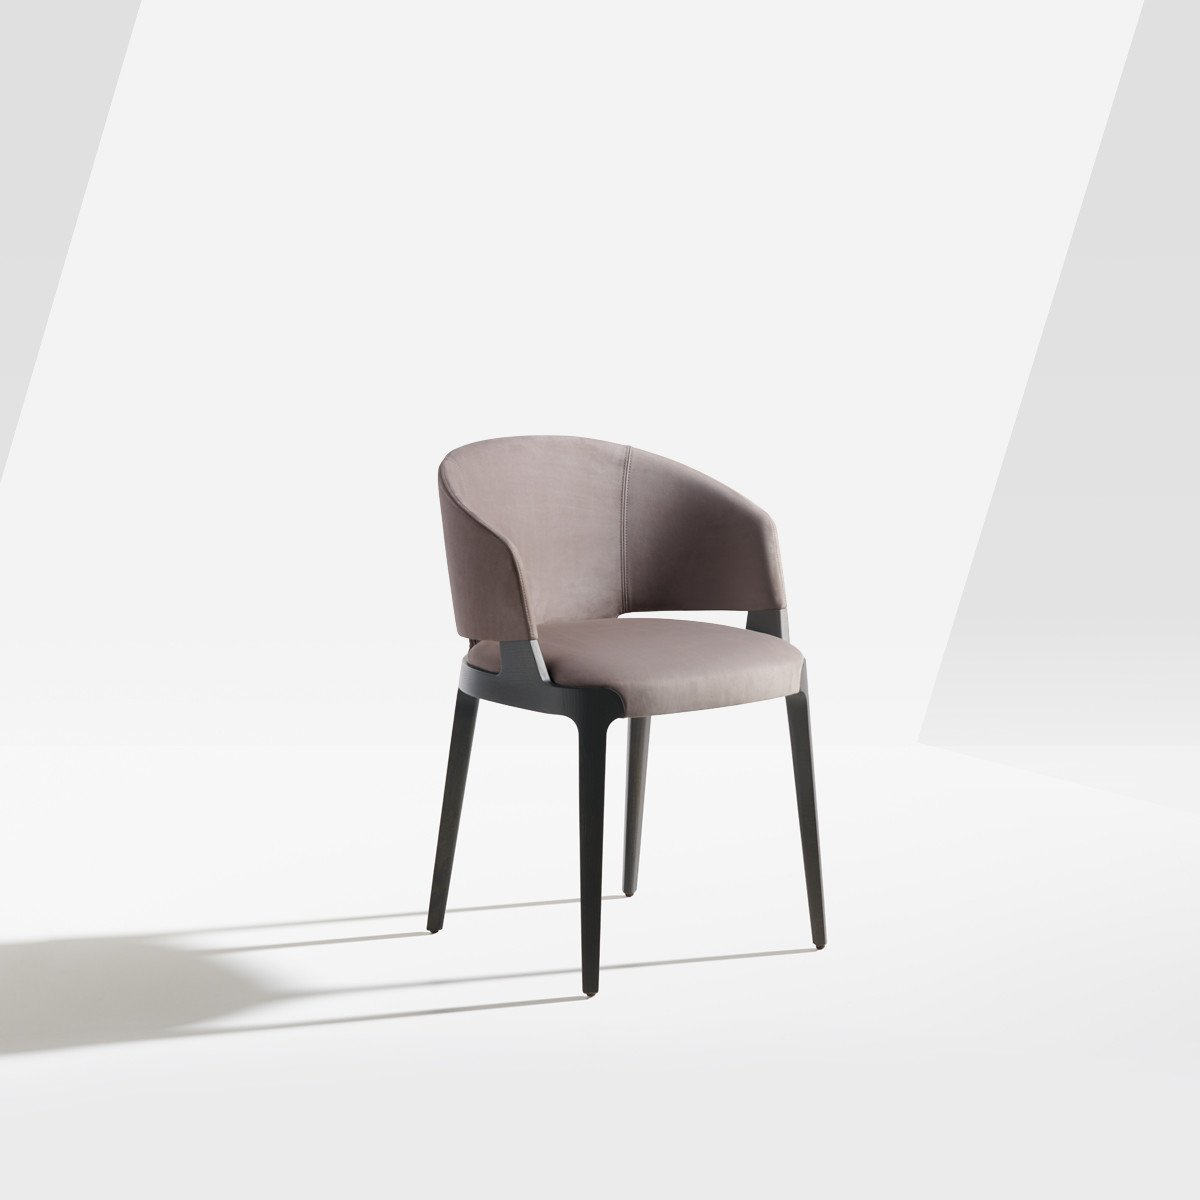 Velis Tub Chair from Potocco, designed by Mario Ferrarini